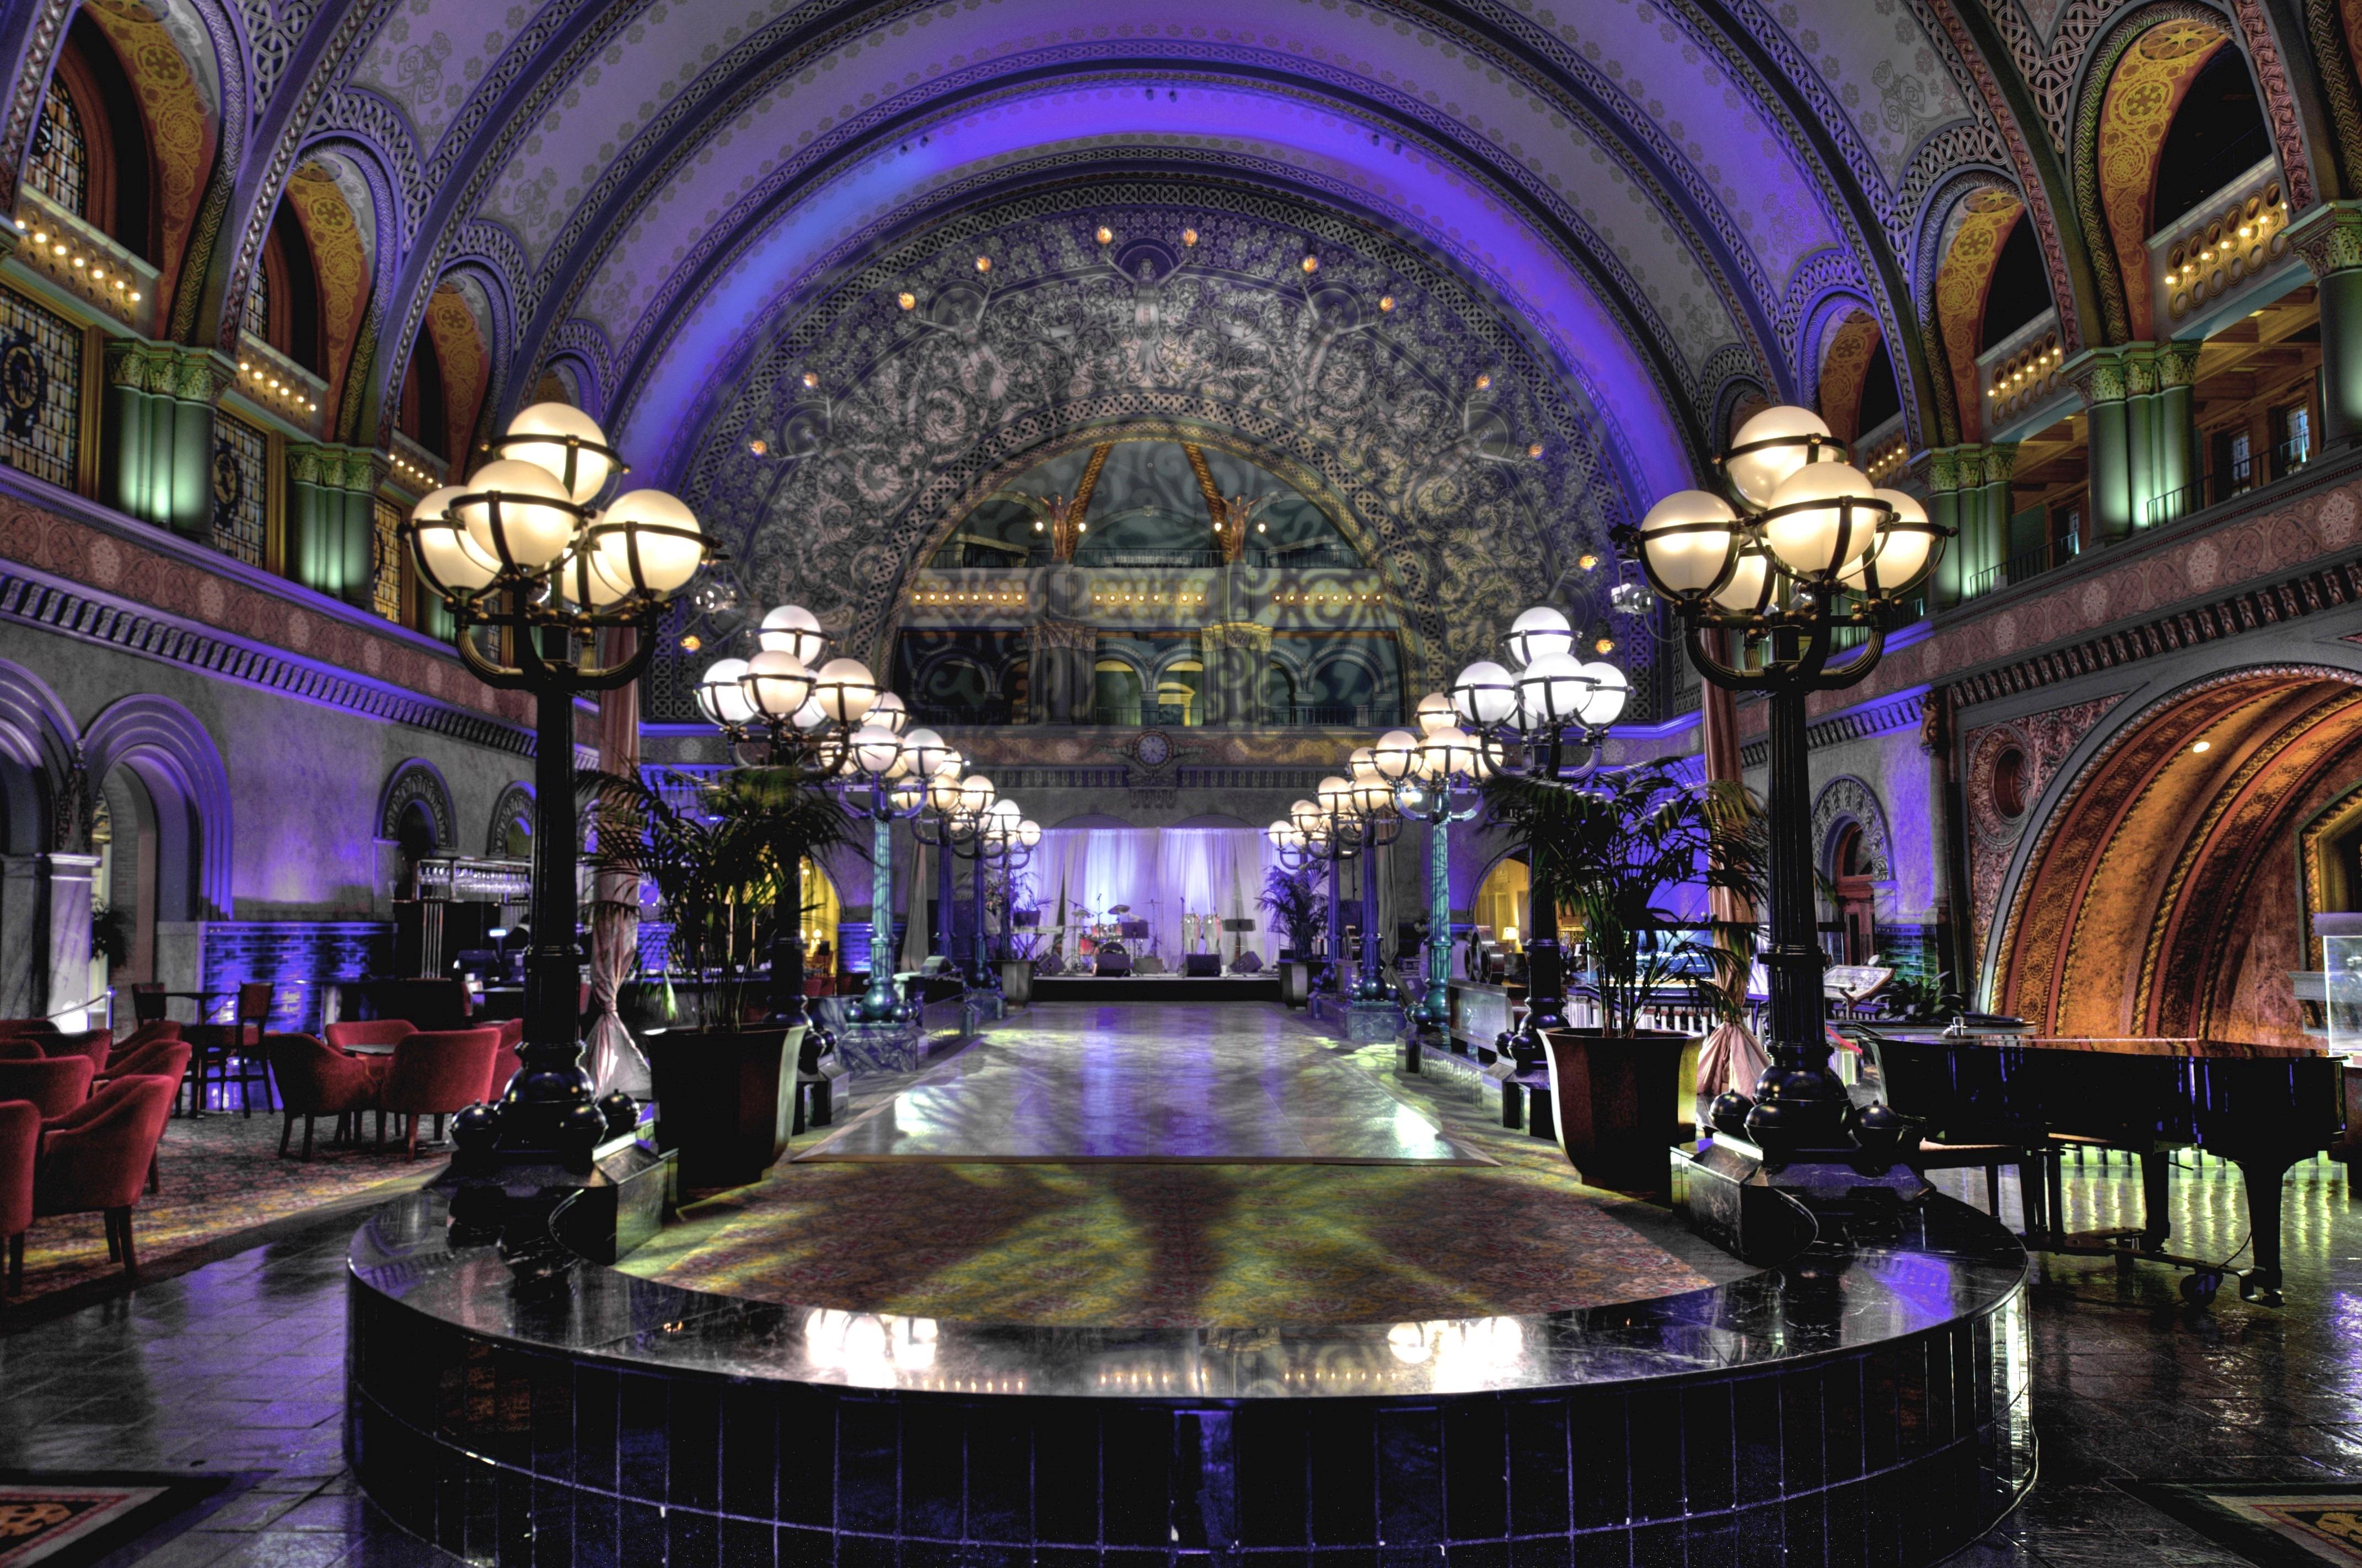 Luxury Central Hotel: InterContinental Paris - Le Grand